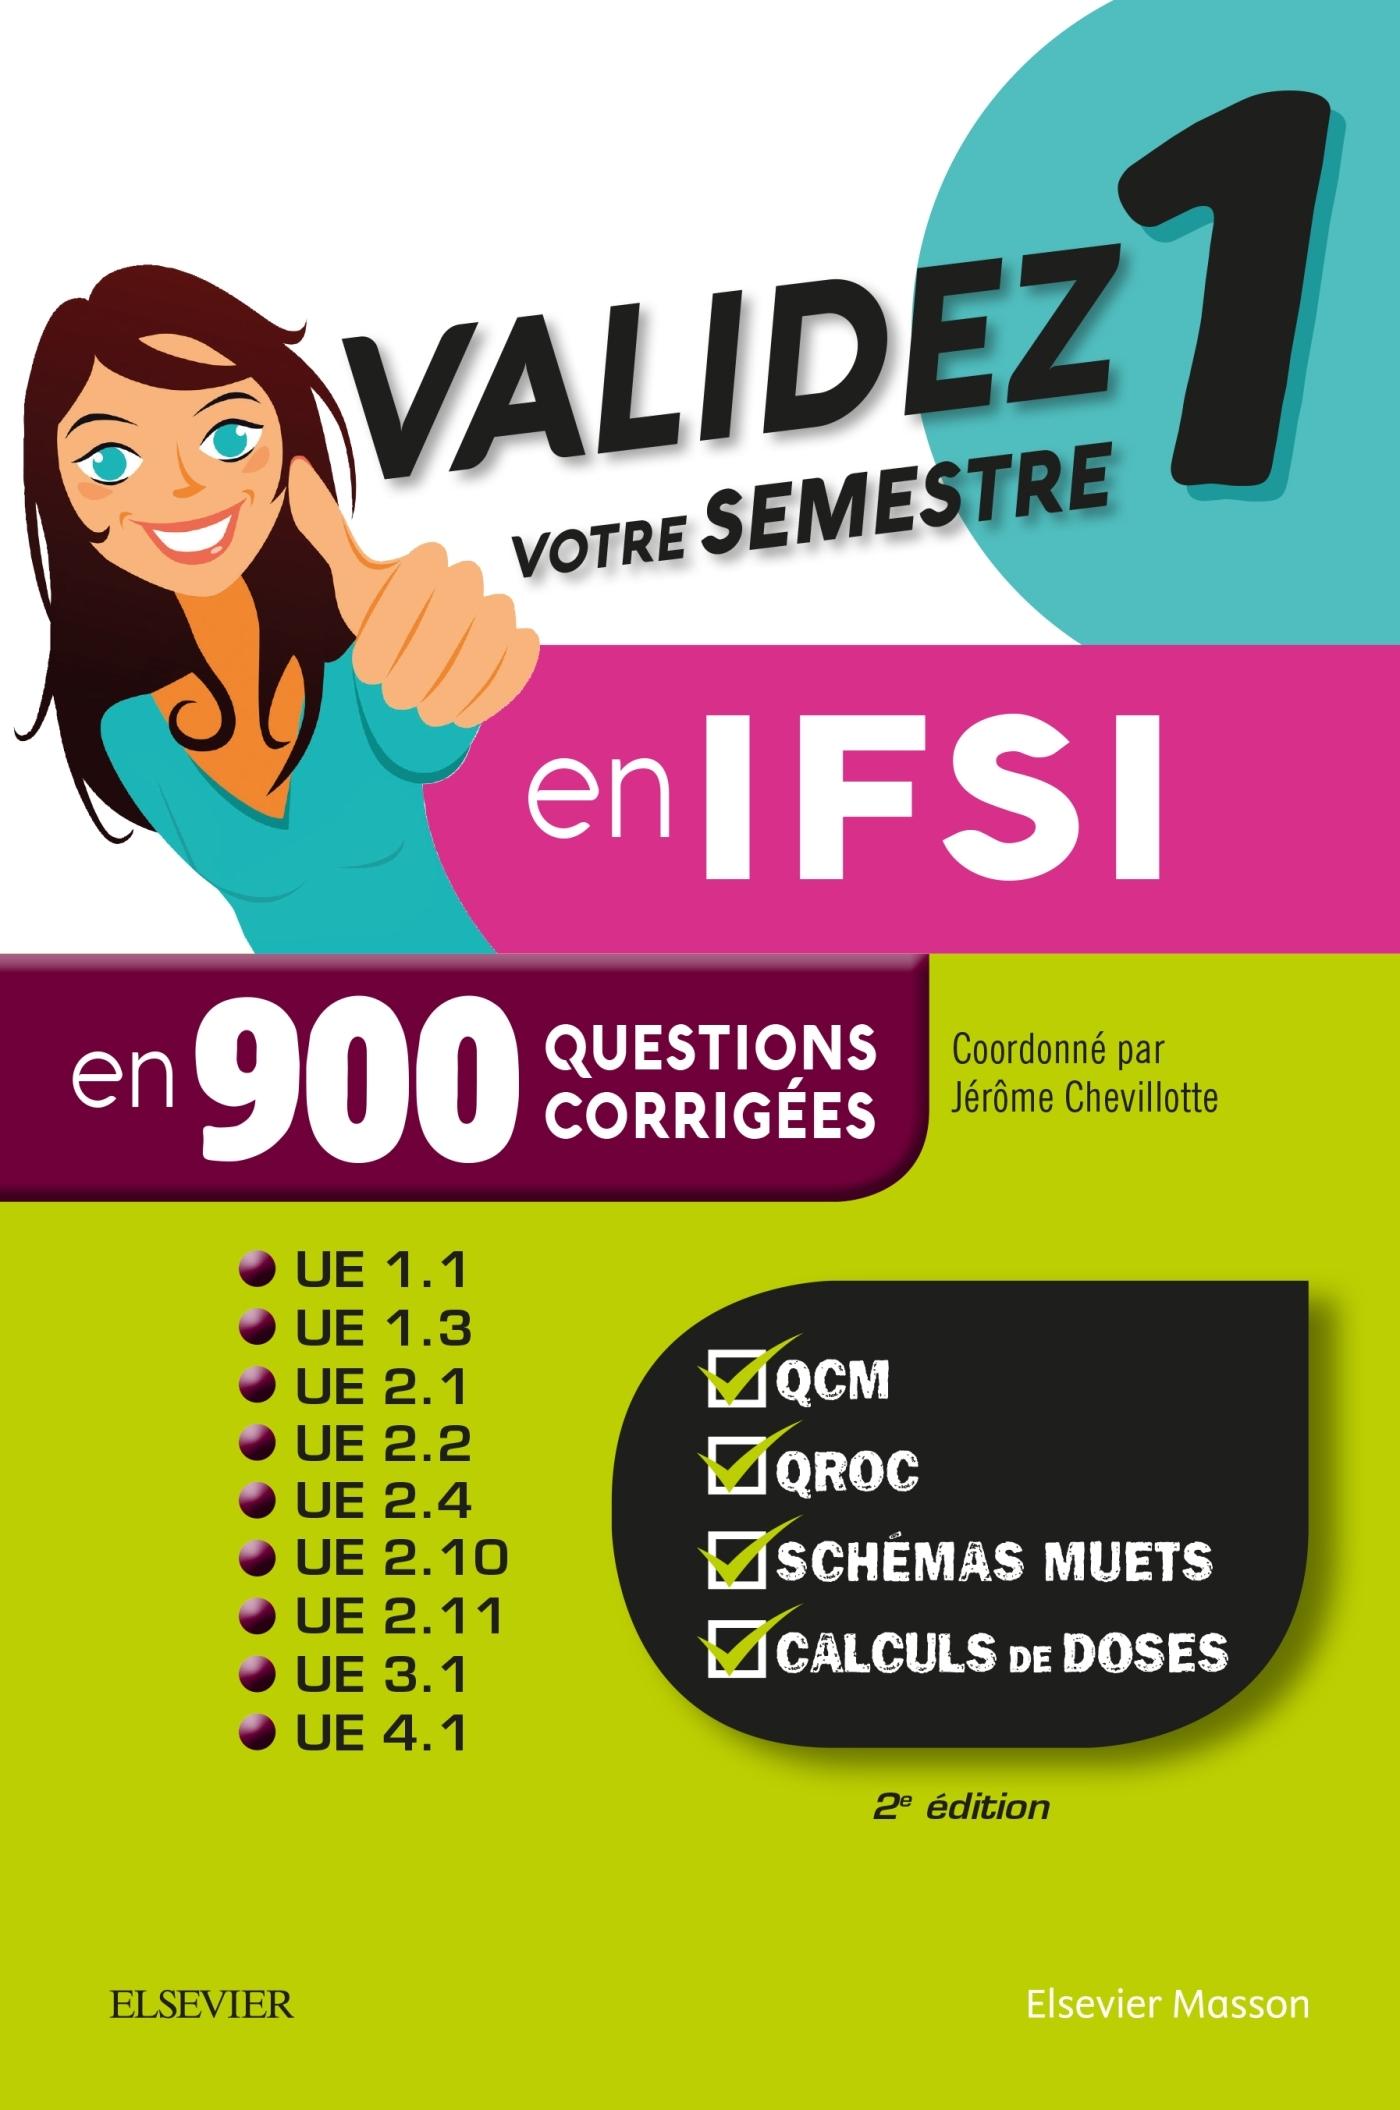 VALIDEZ VOTRE SEMESTRE 1 EN IFSI EN 900 QUESTIONS CORRIGEES